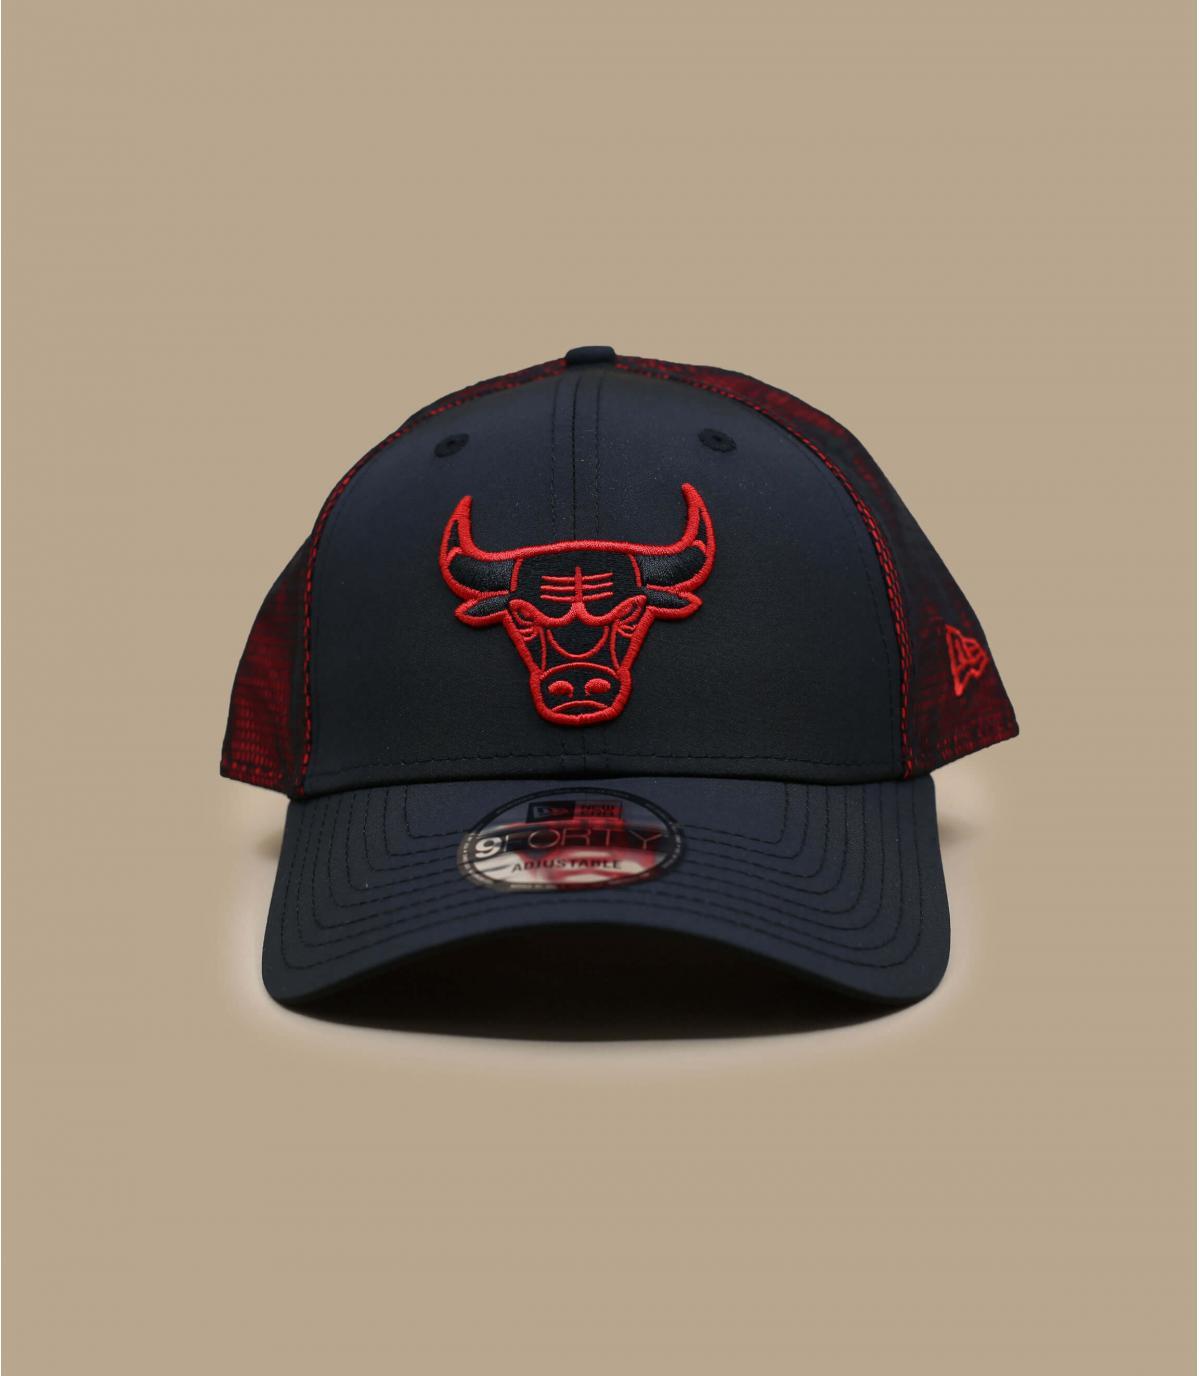 Details Mesh Underlay Bulls 940 black - Abbildung 2